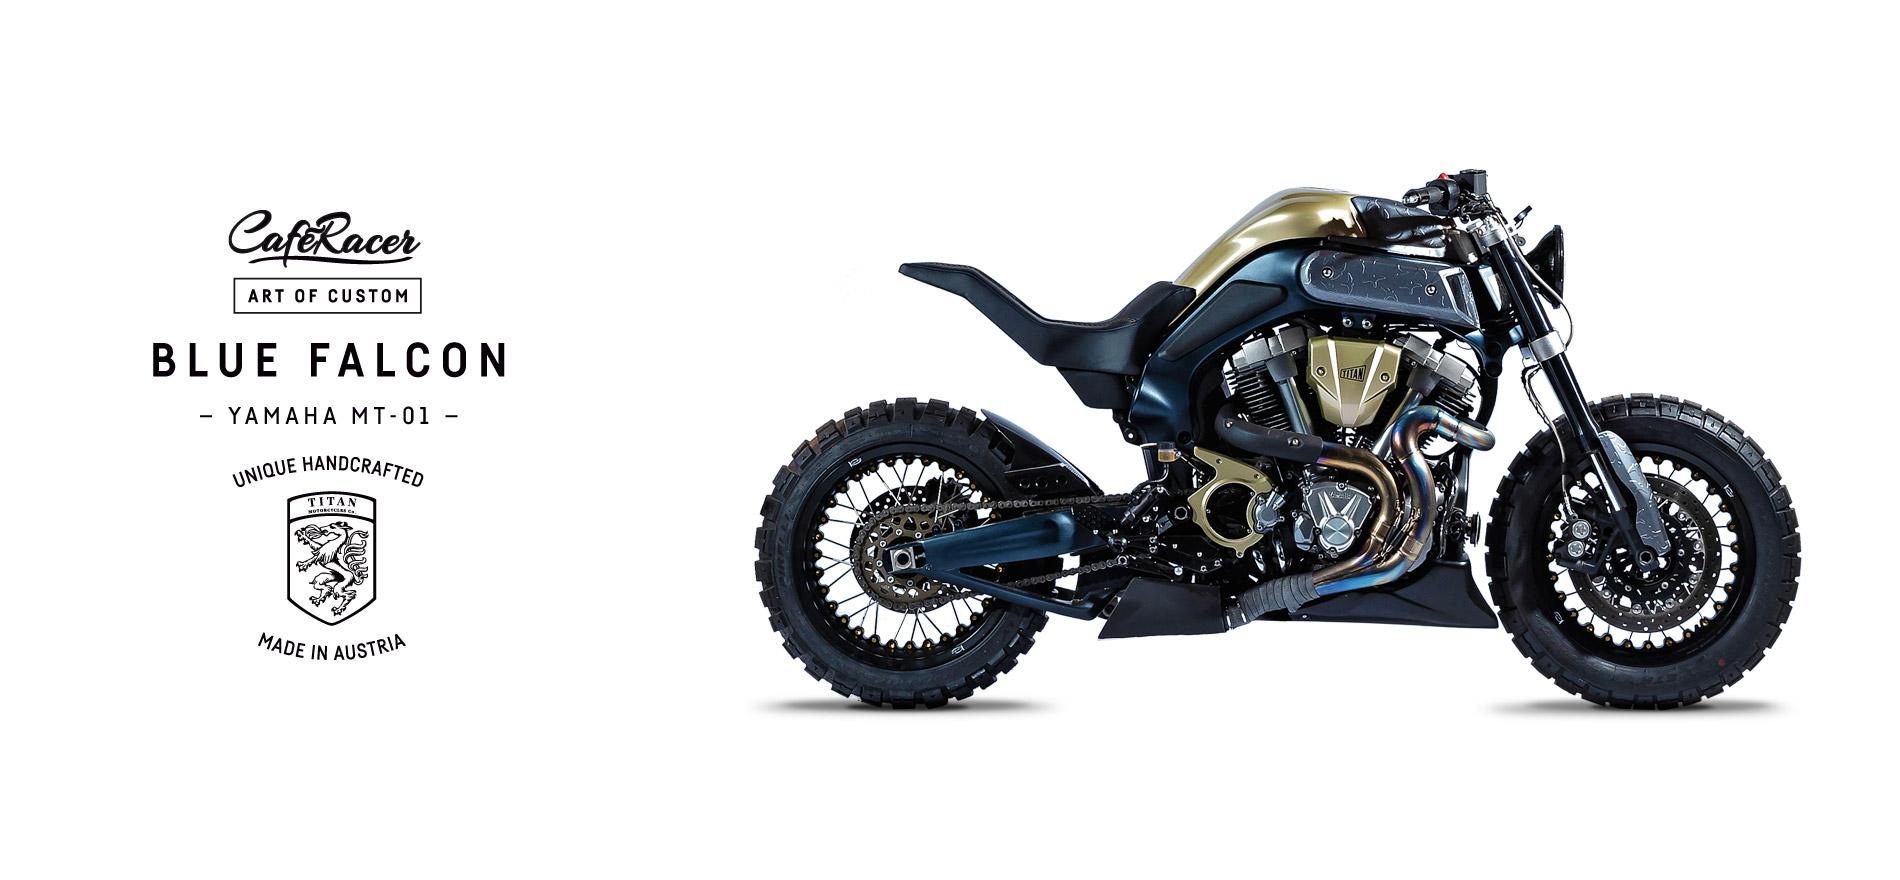 TITAN_CustomBike_CafeRacer_Graz_MadeInAustria_Before-After_Blue-Falcon_Yamaha-MT-01_Motorradumbau_Full